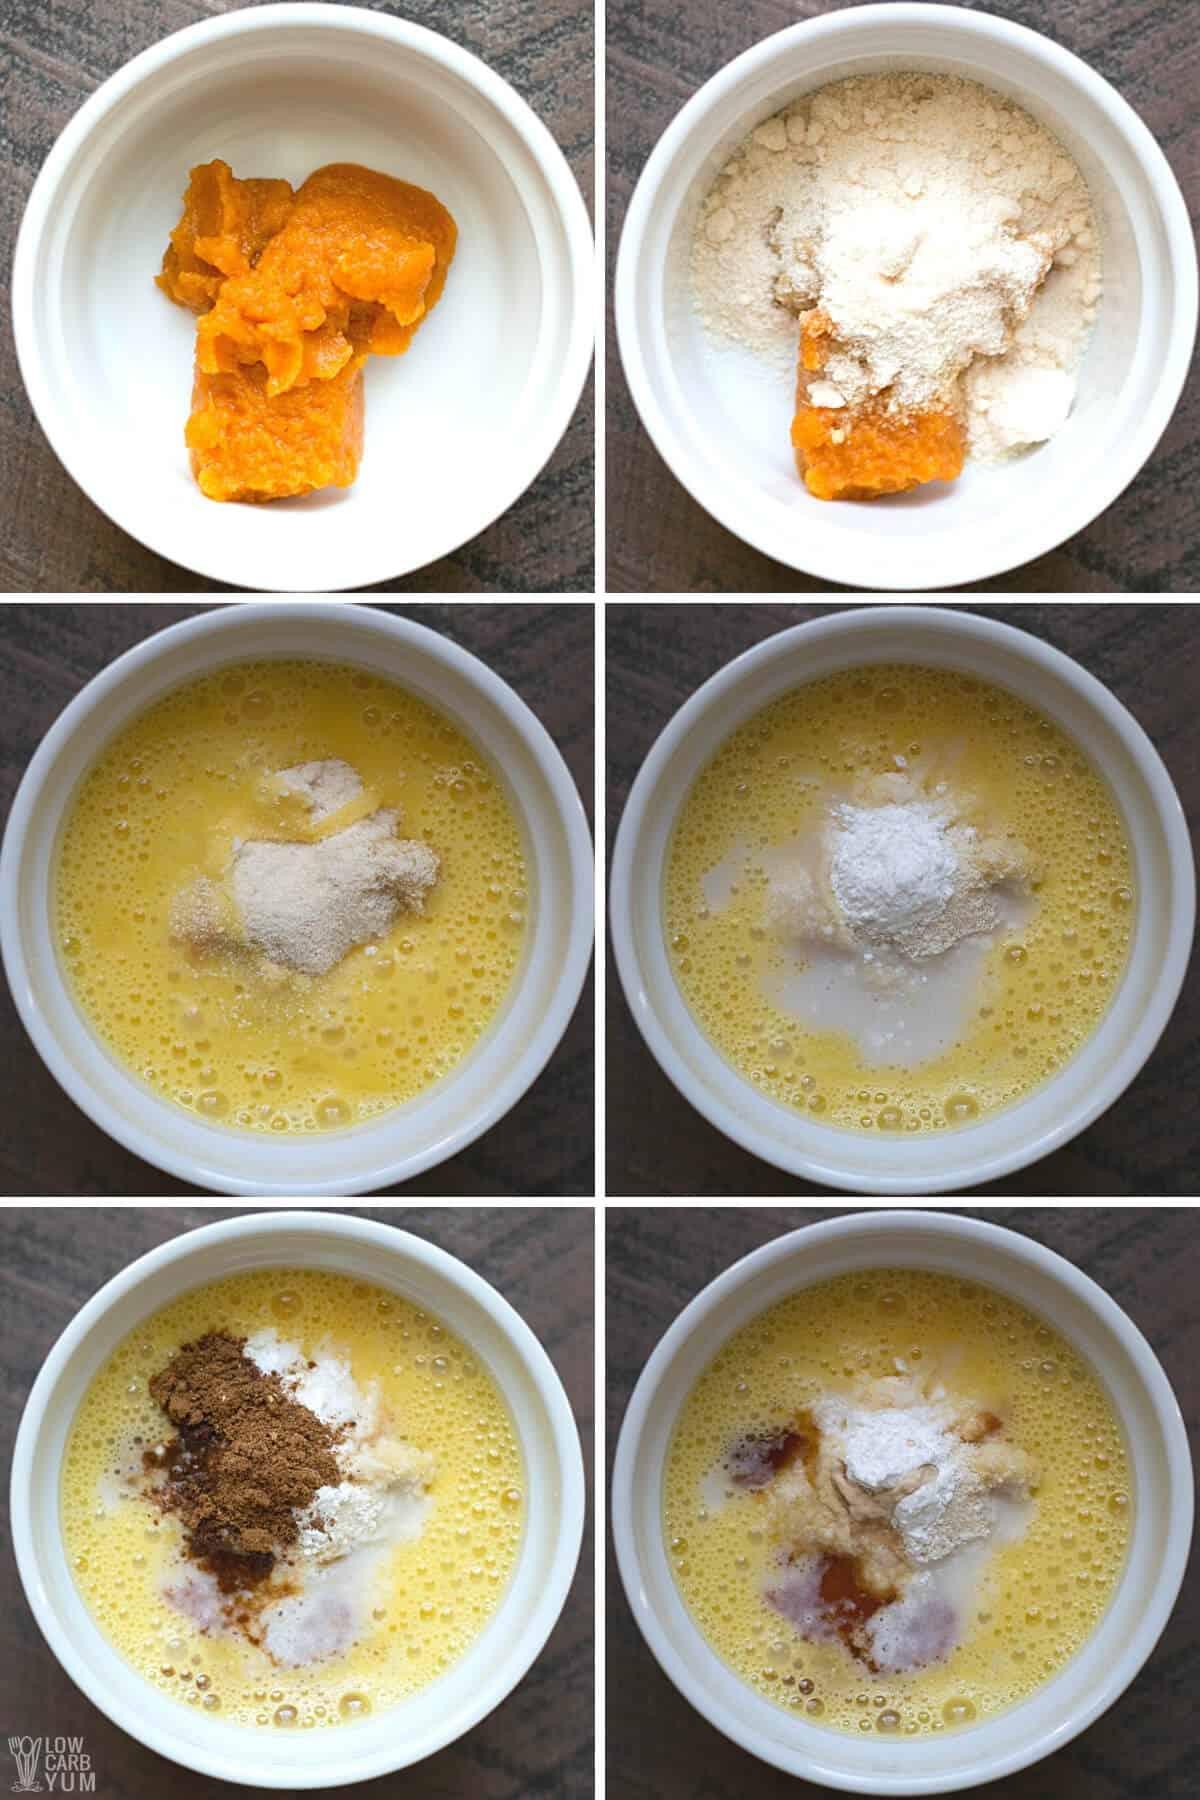 adding ingredients to ramekin